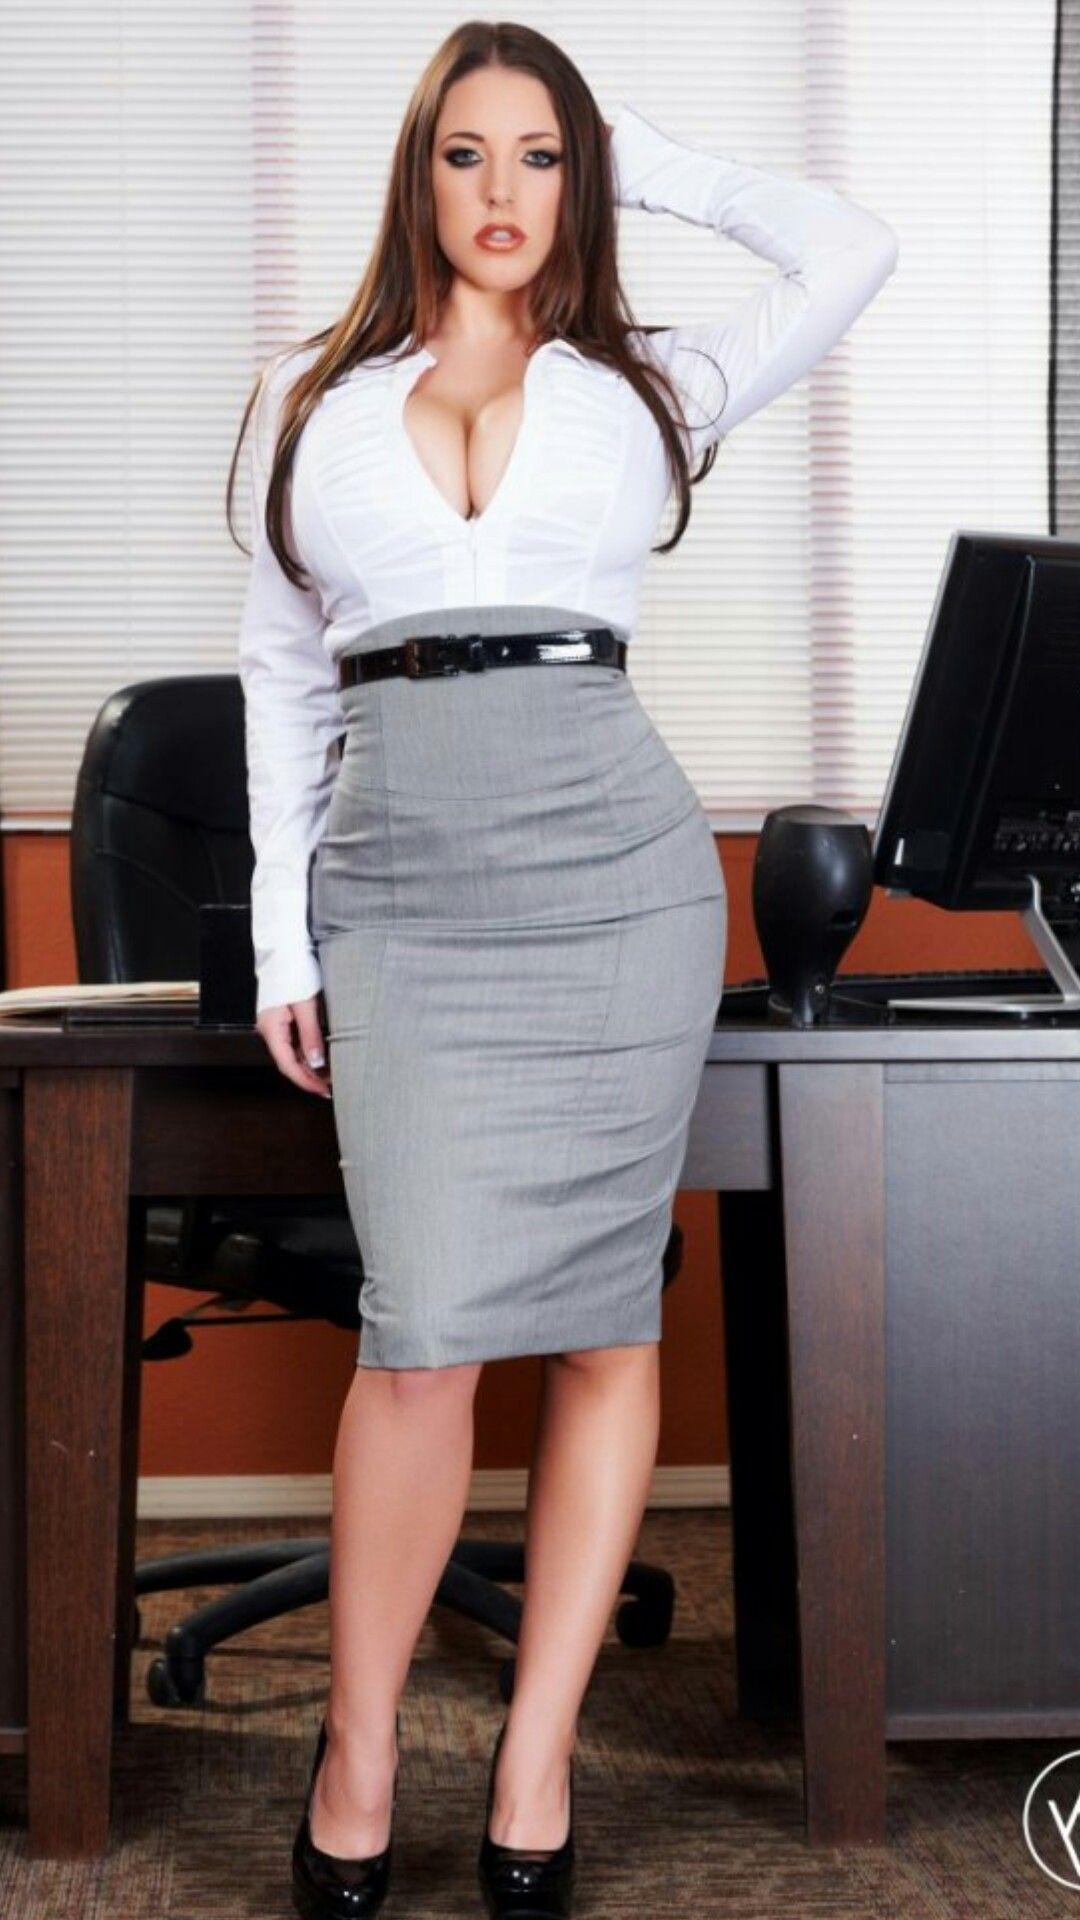 Busty Secretary Blowjob